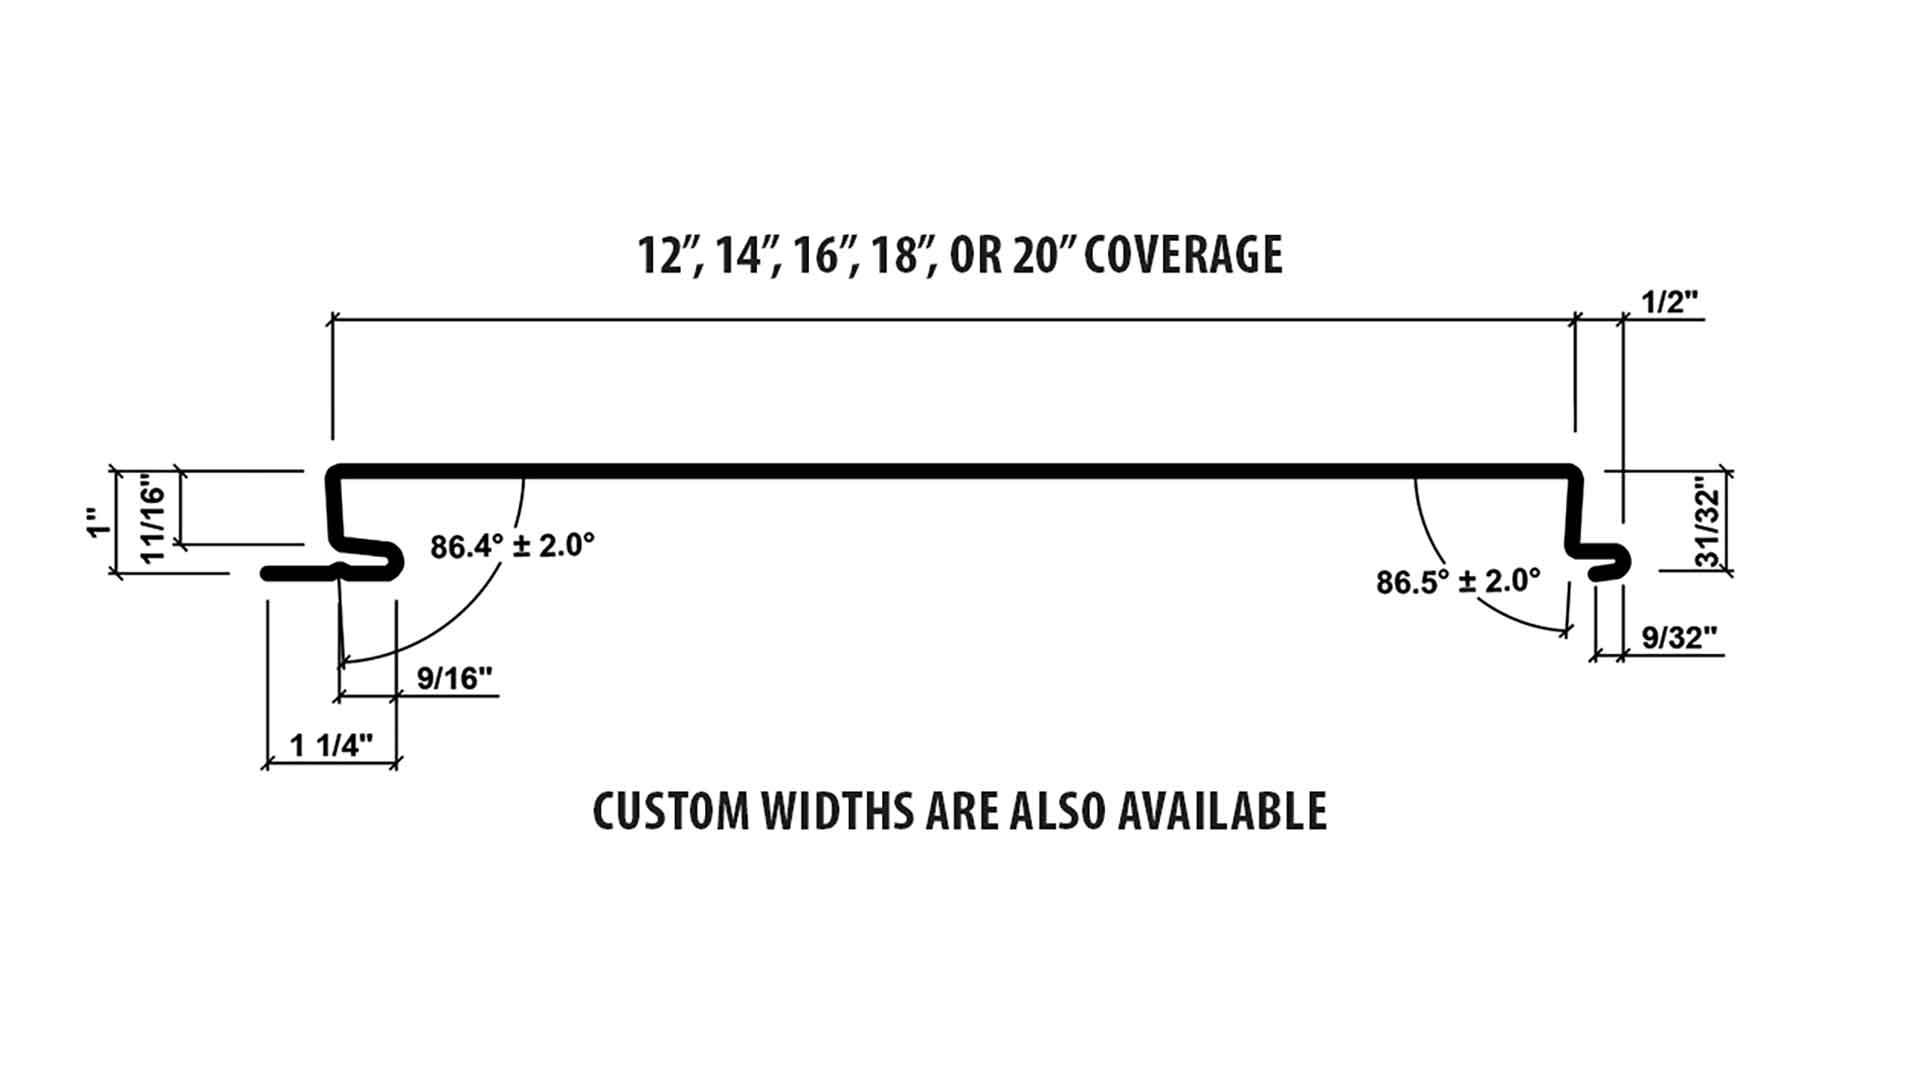 https://f.hubspotusercontent30.net/hubfs/6069238/images/line-drawings/t-groove-metal-flush-wall-panel-dimensions.jpg